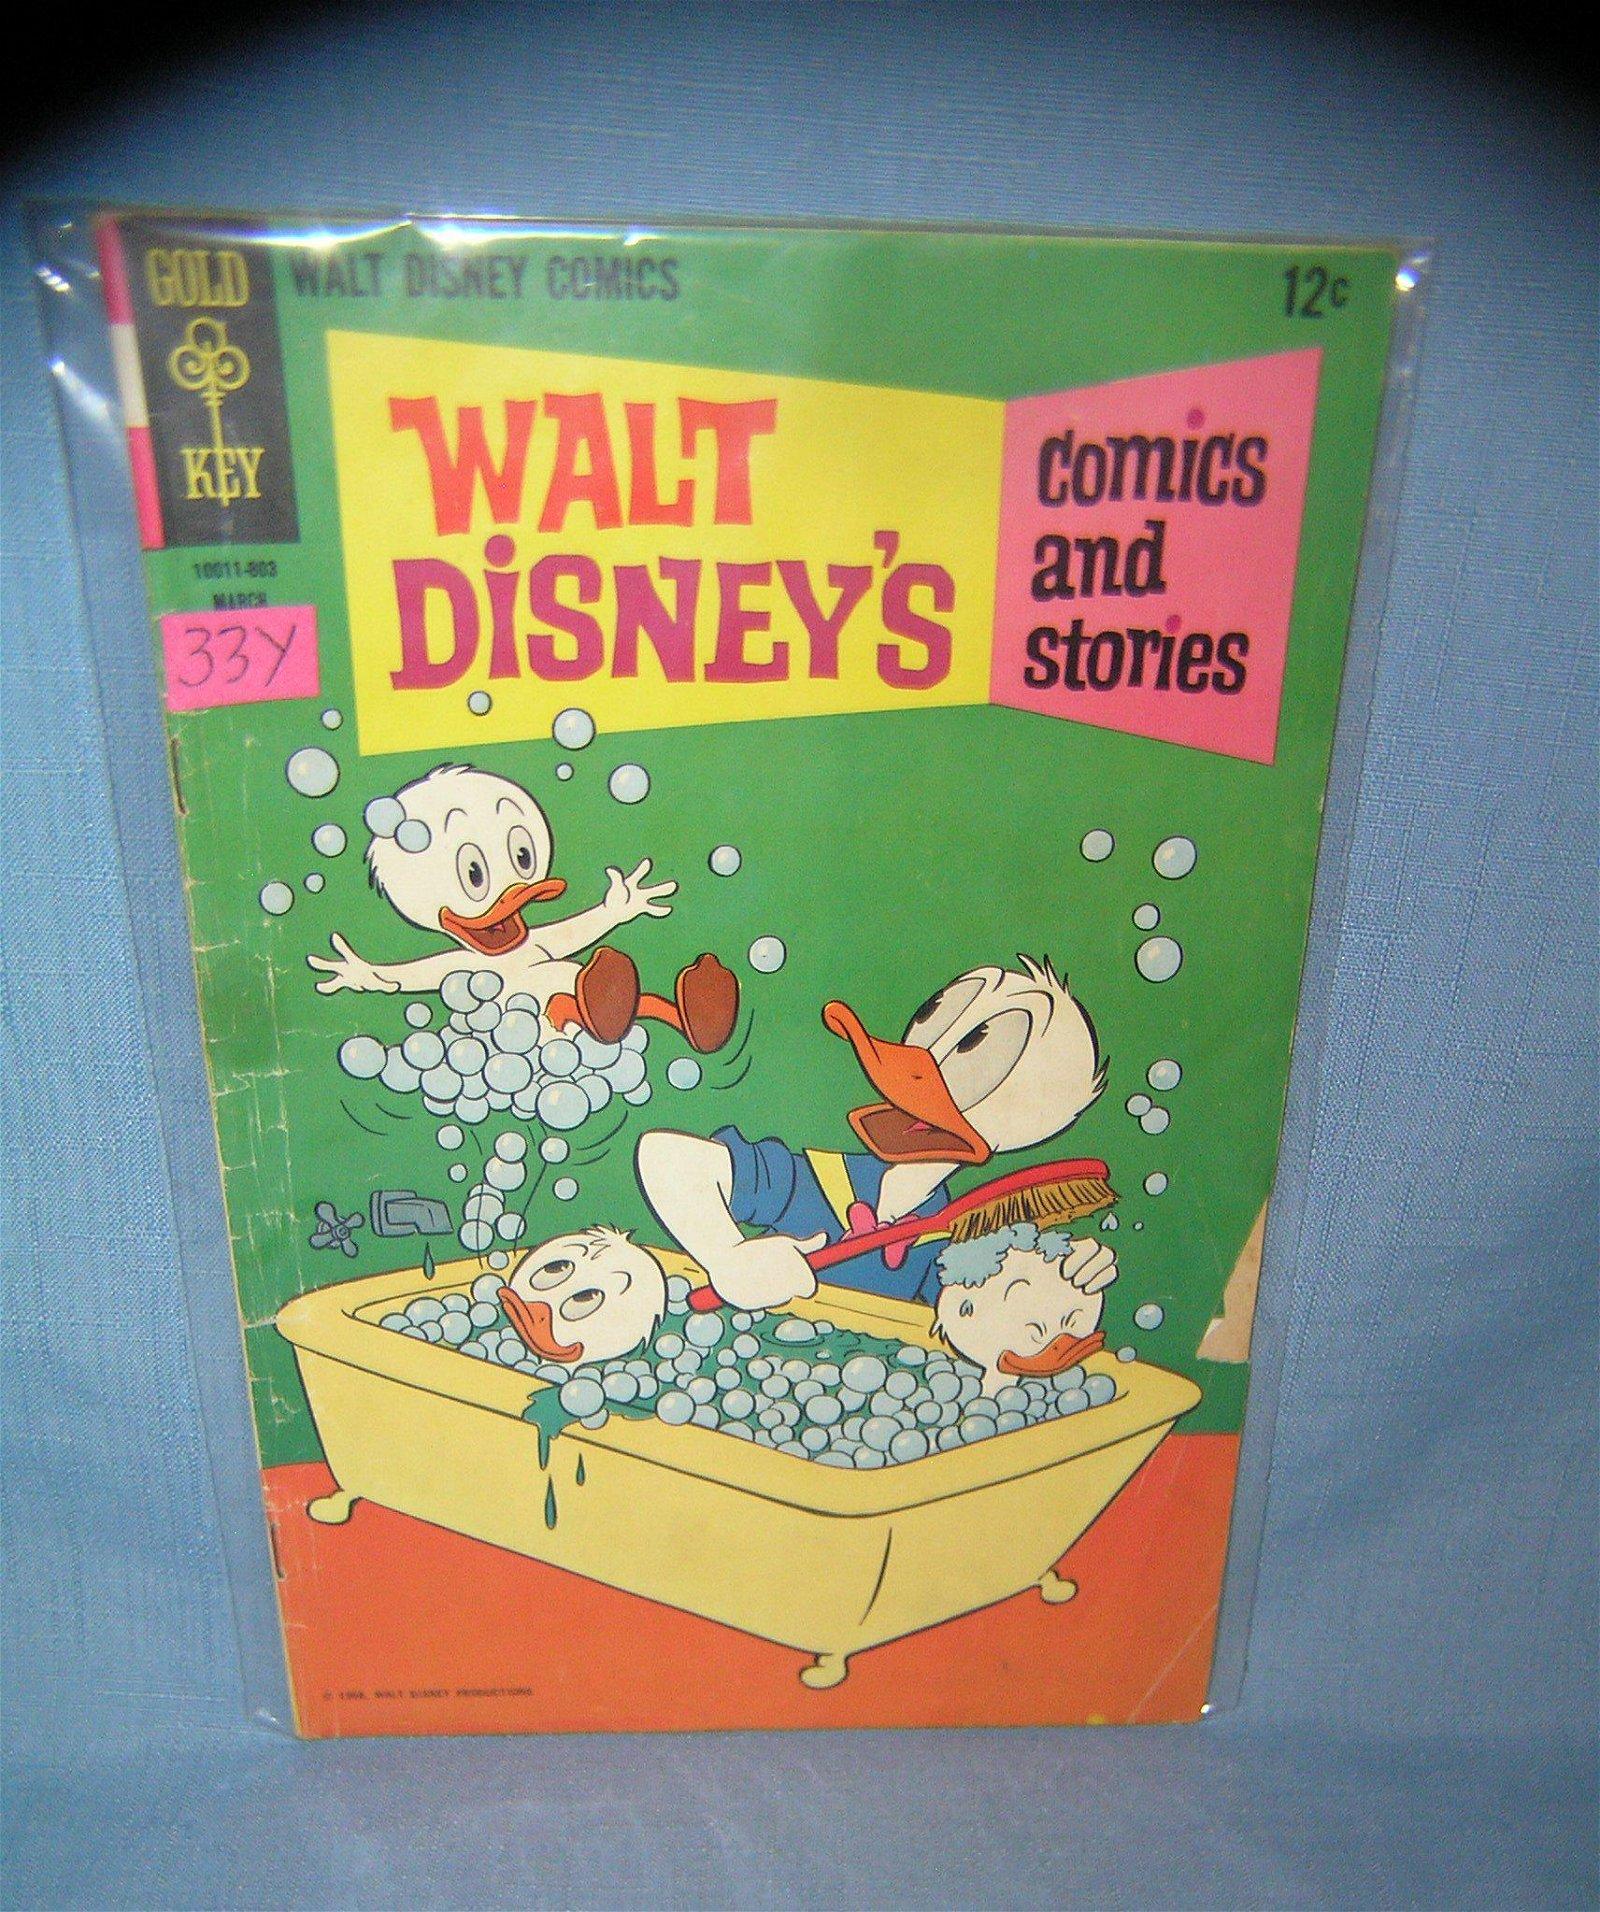 Disney's comics and stories comic book